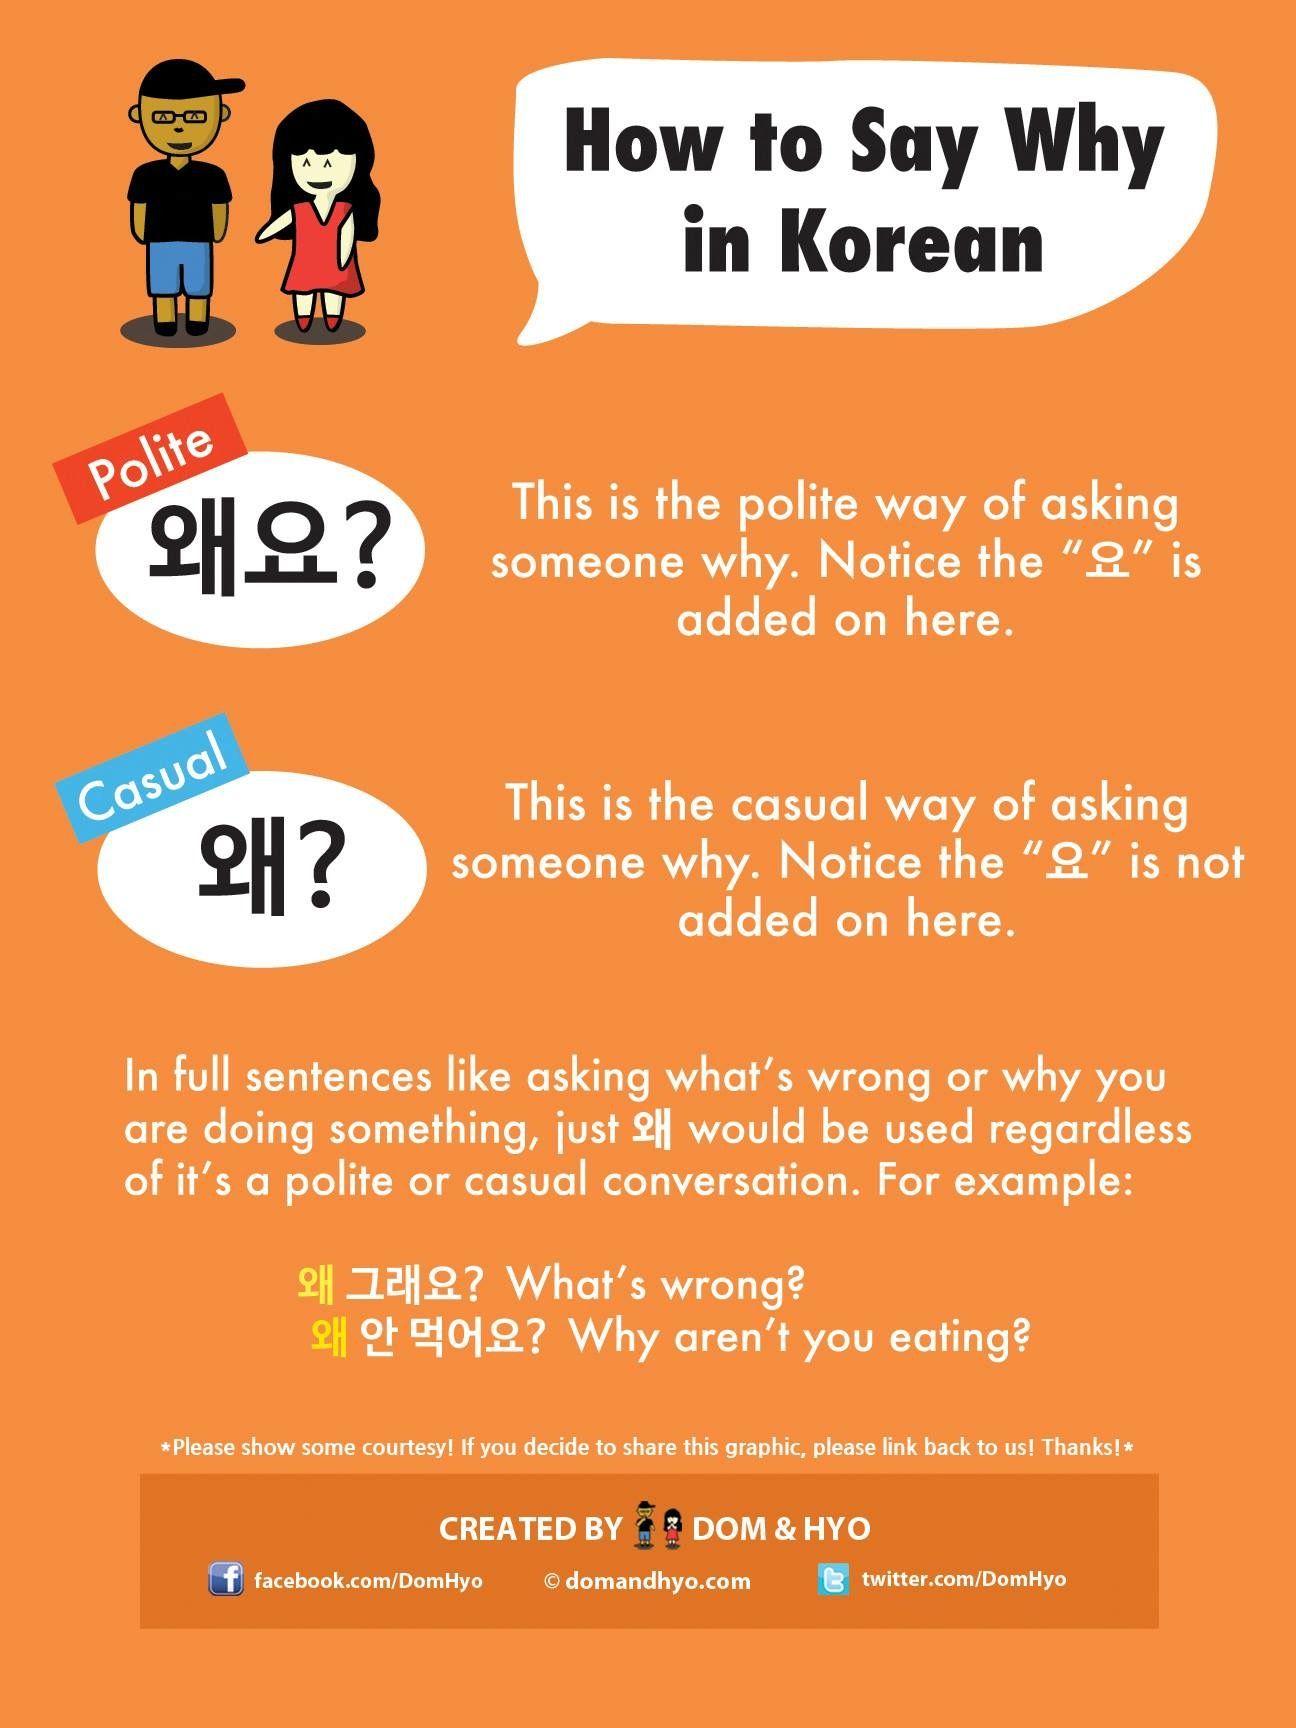 How To Say Why In Korean Korean Language Korean Language Learning Learn Basic Korean